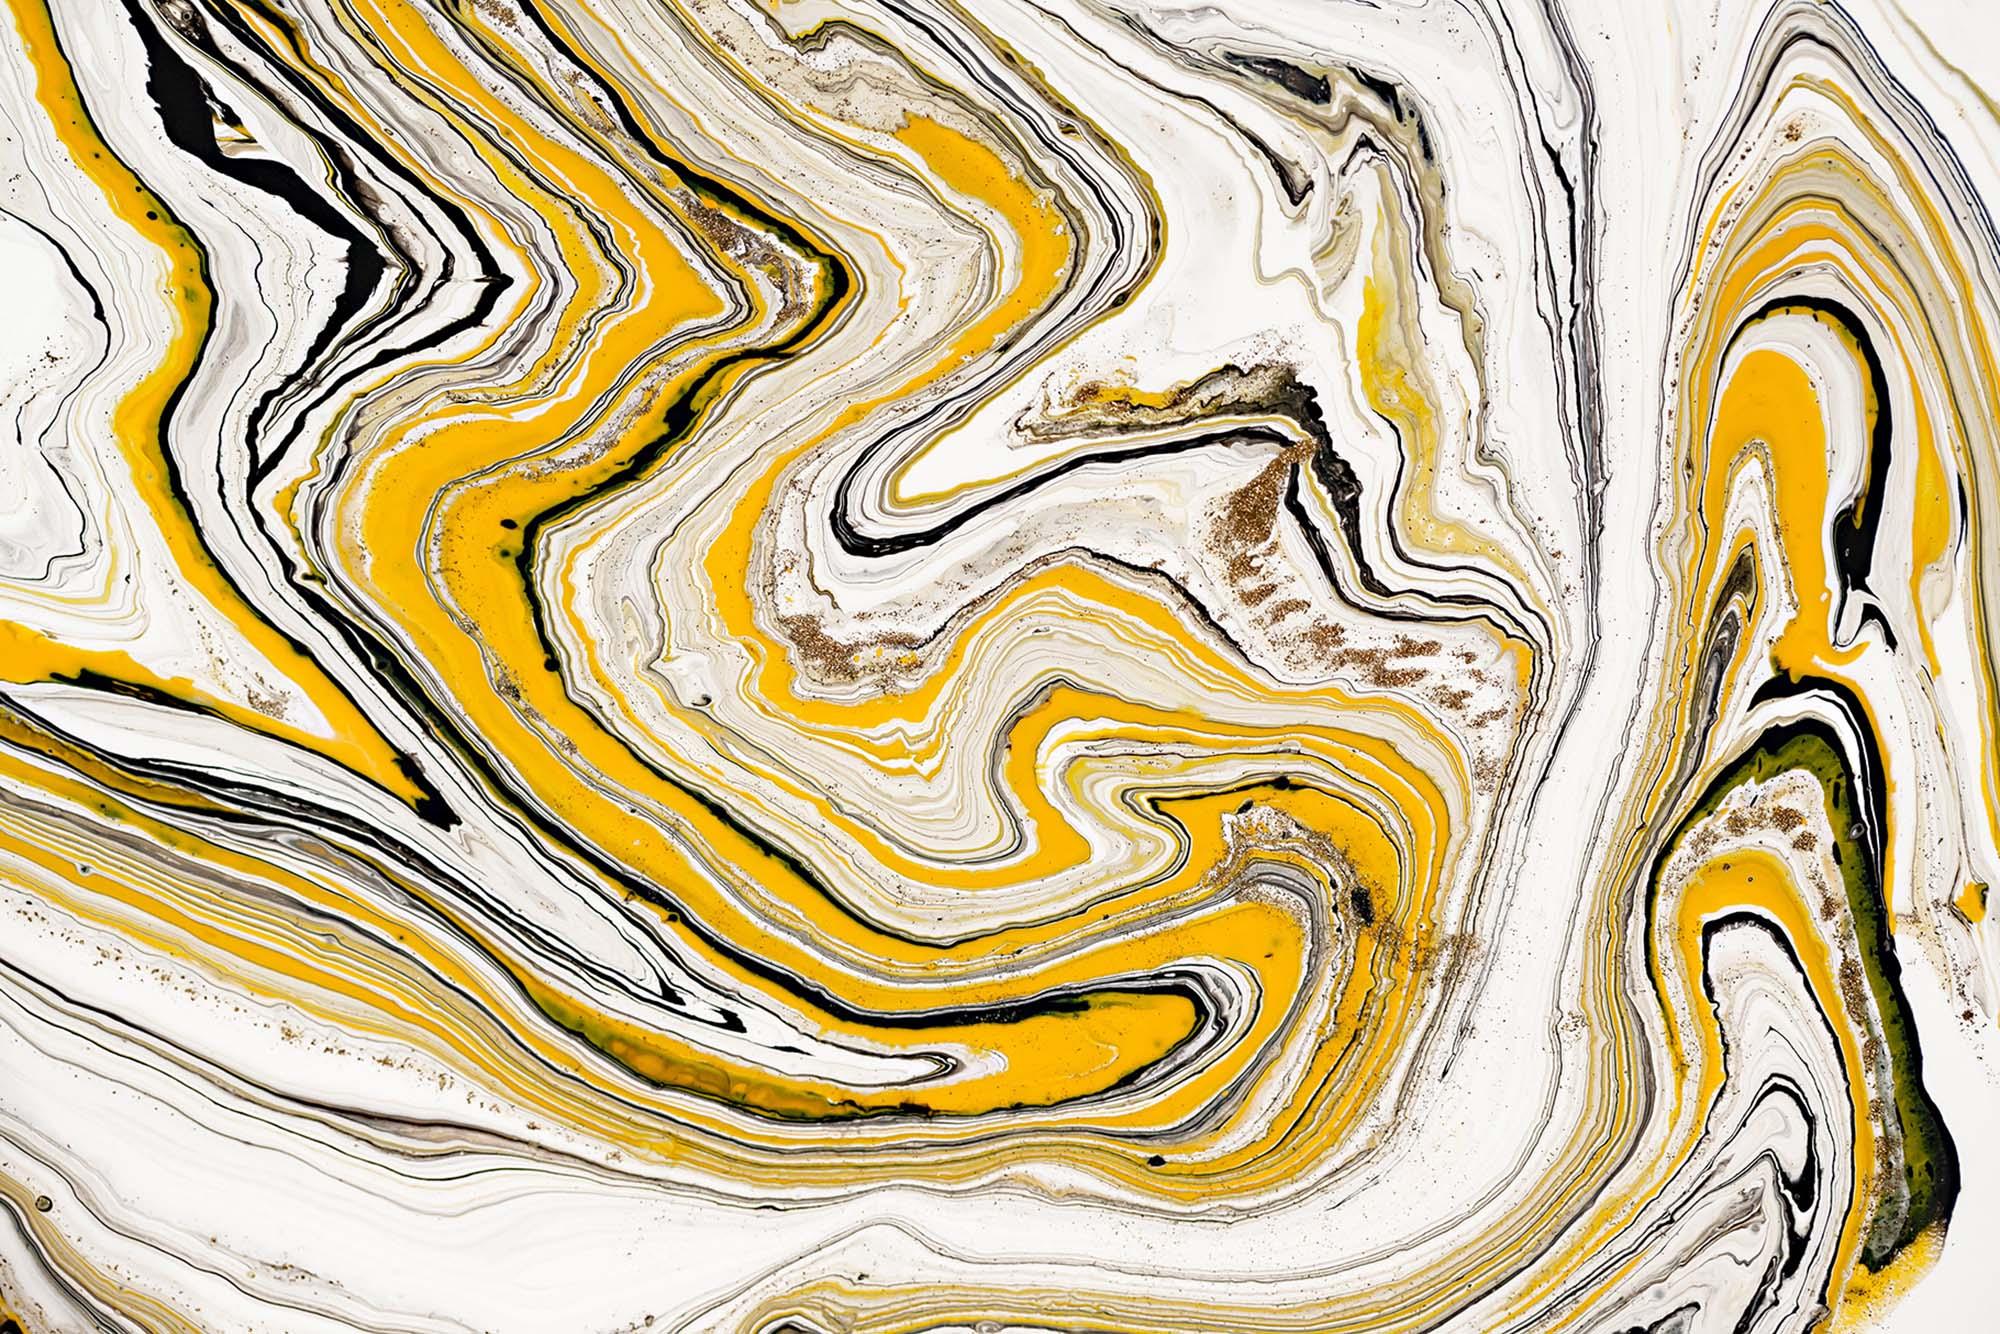 Acrylic Liquid Paint Textures 3